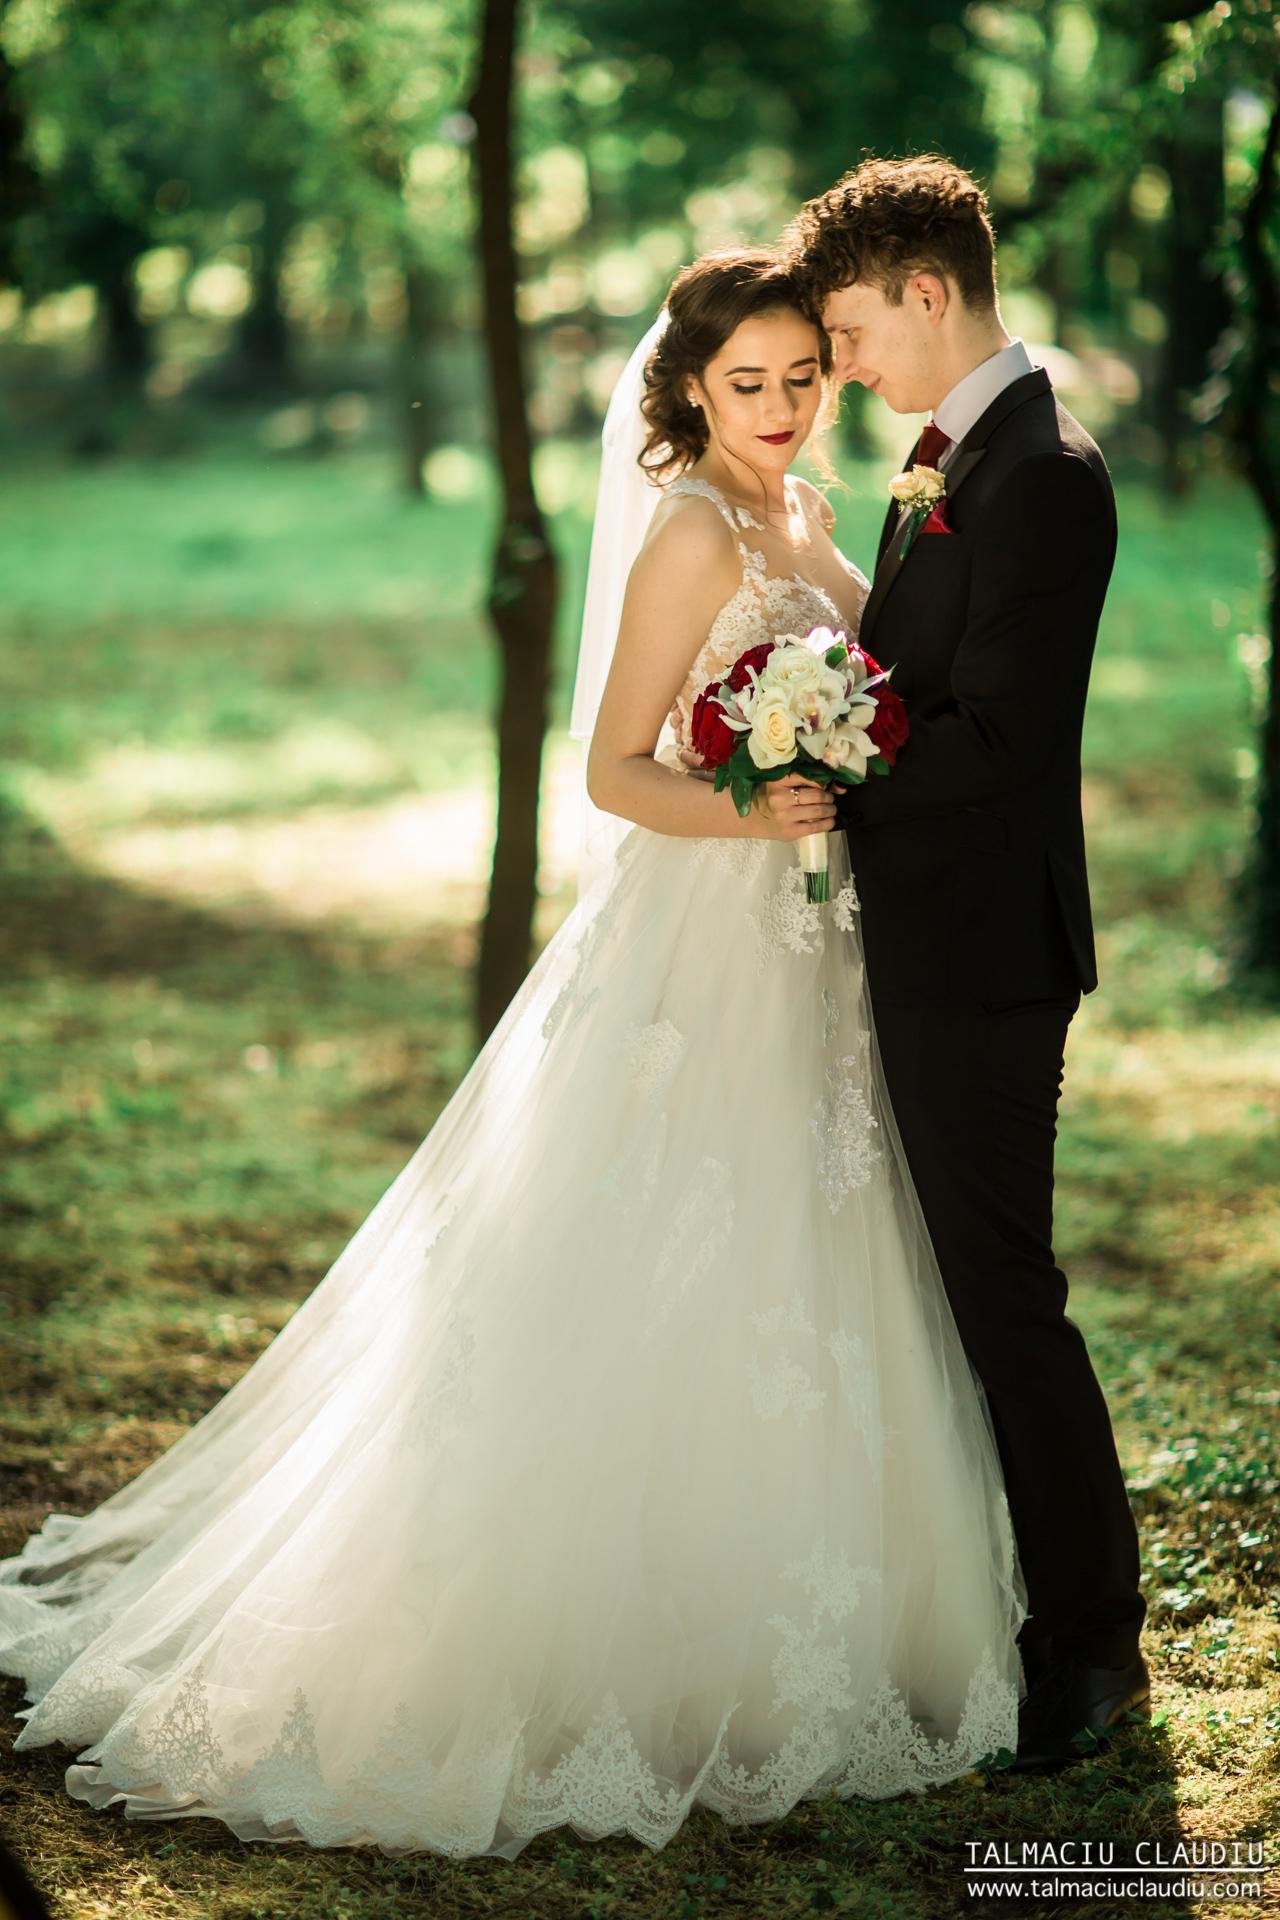 Cum sa iti organizezi nunta. Prioritati si mofturi, impresii post-nunta